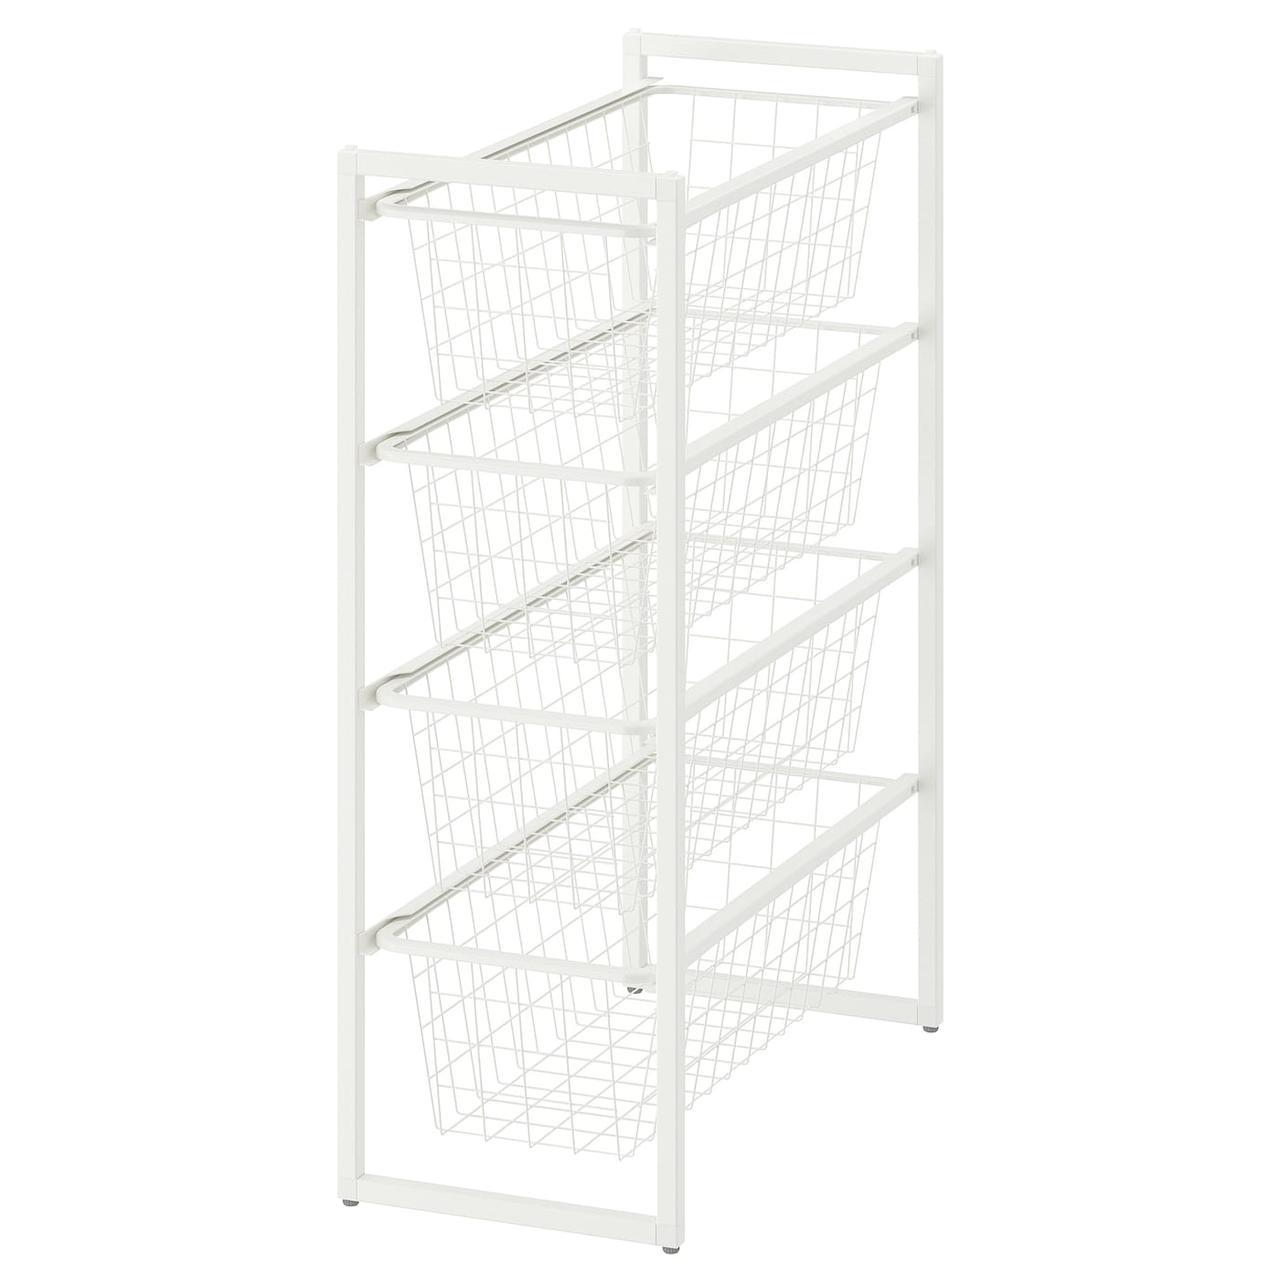 Рама с проволочными корзинами IKEA JONAXEL белый 892.971.30